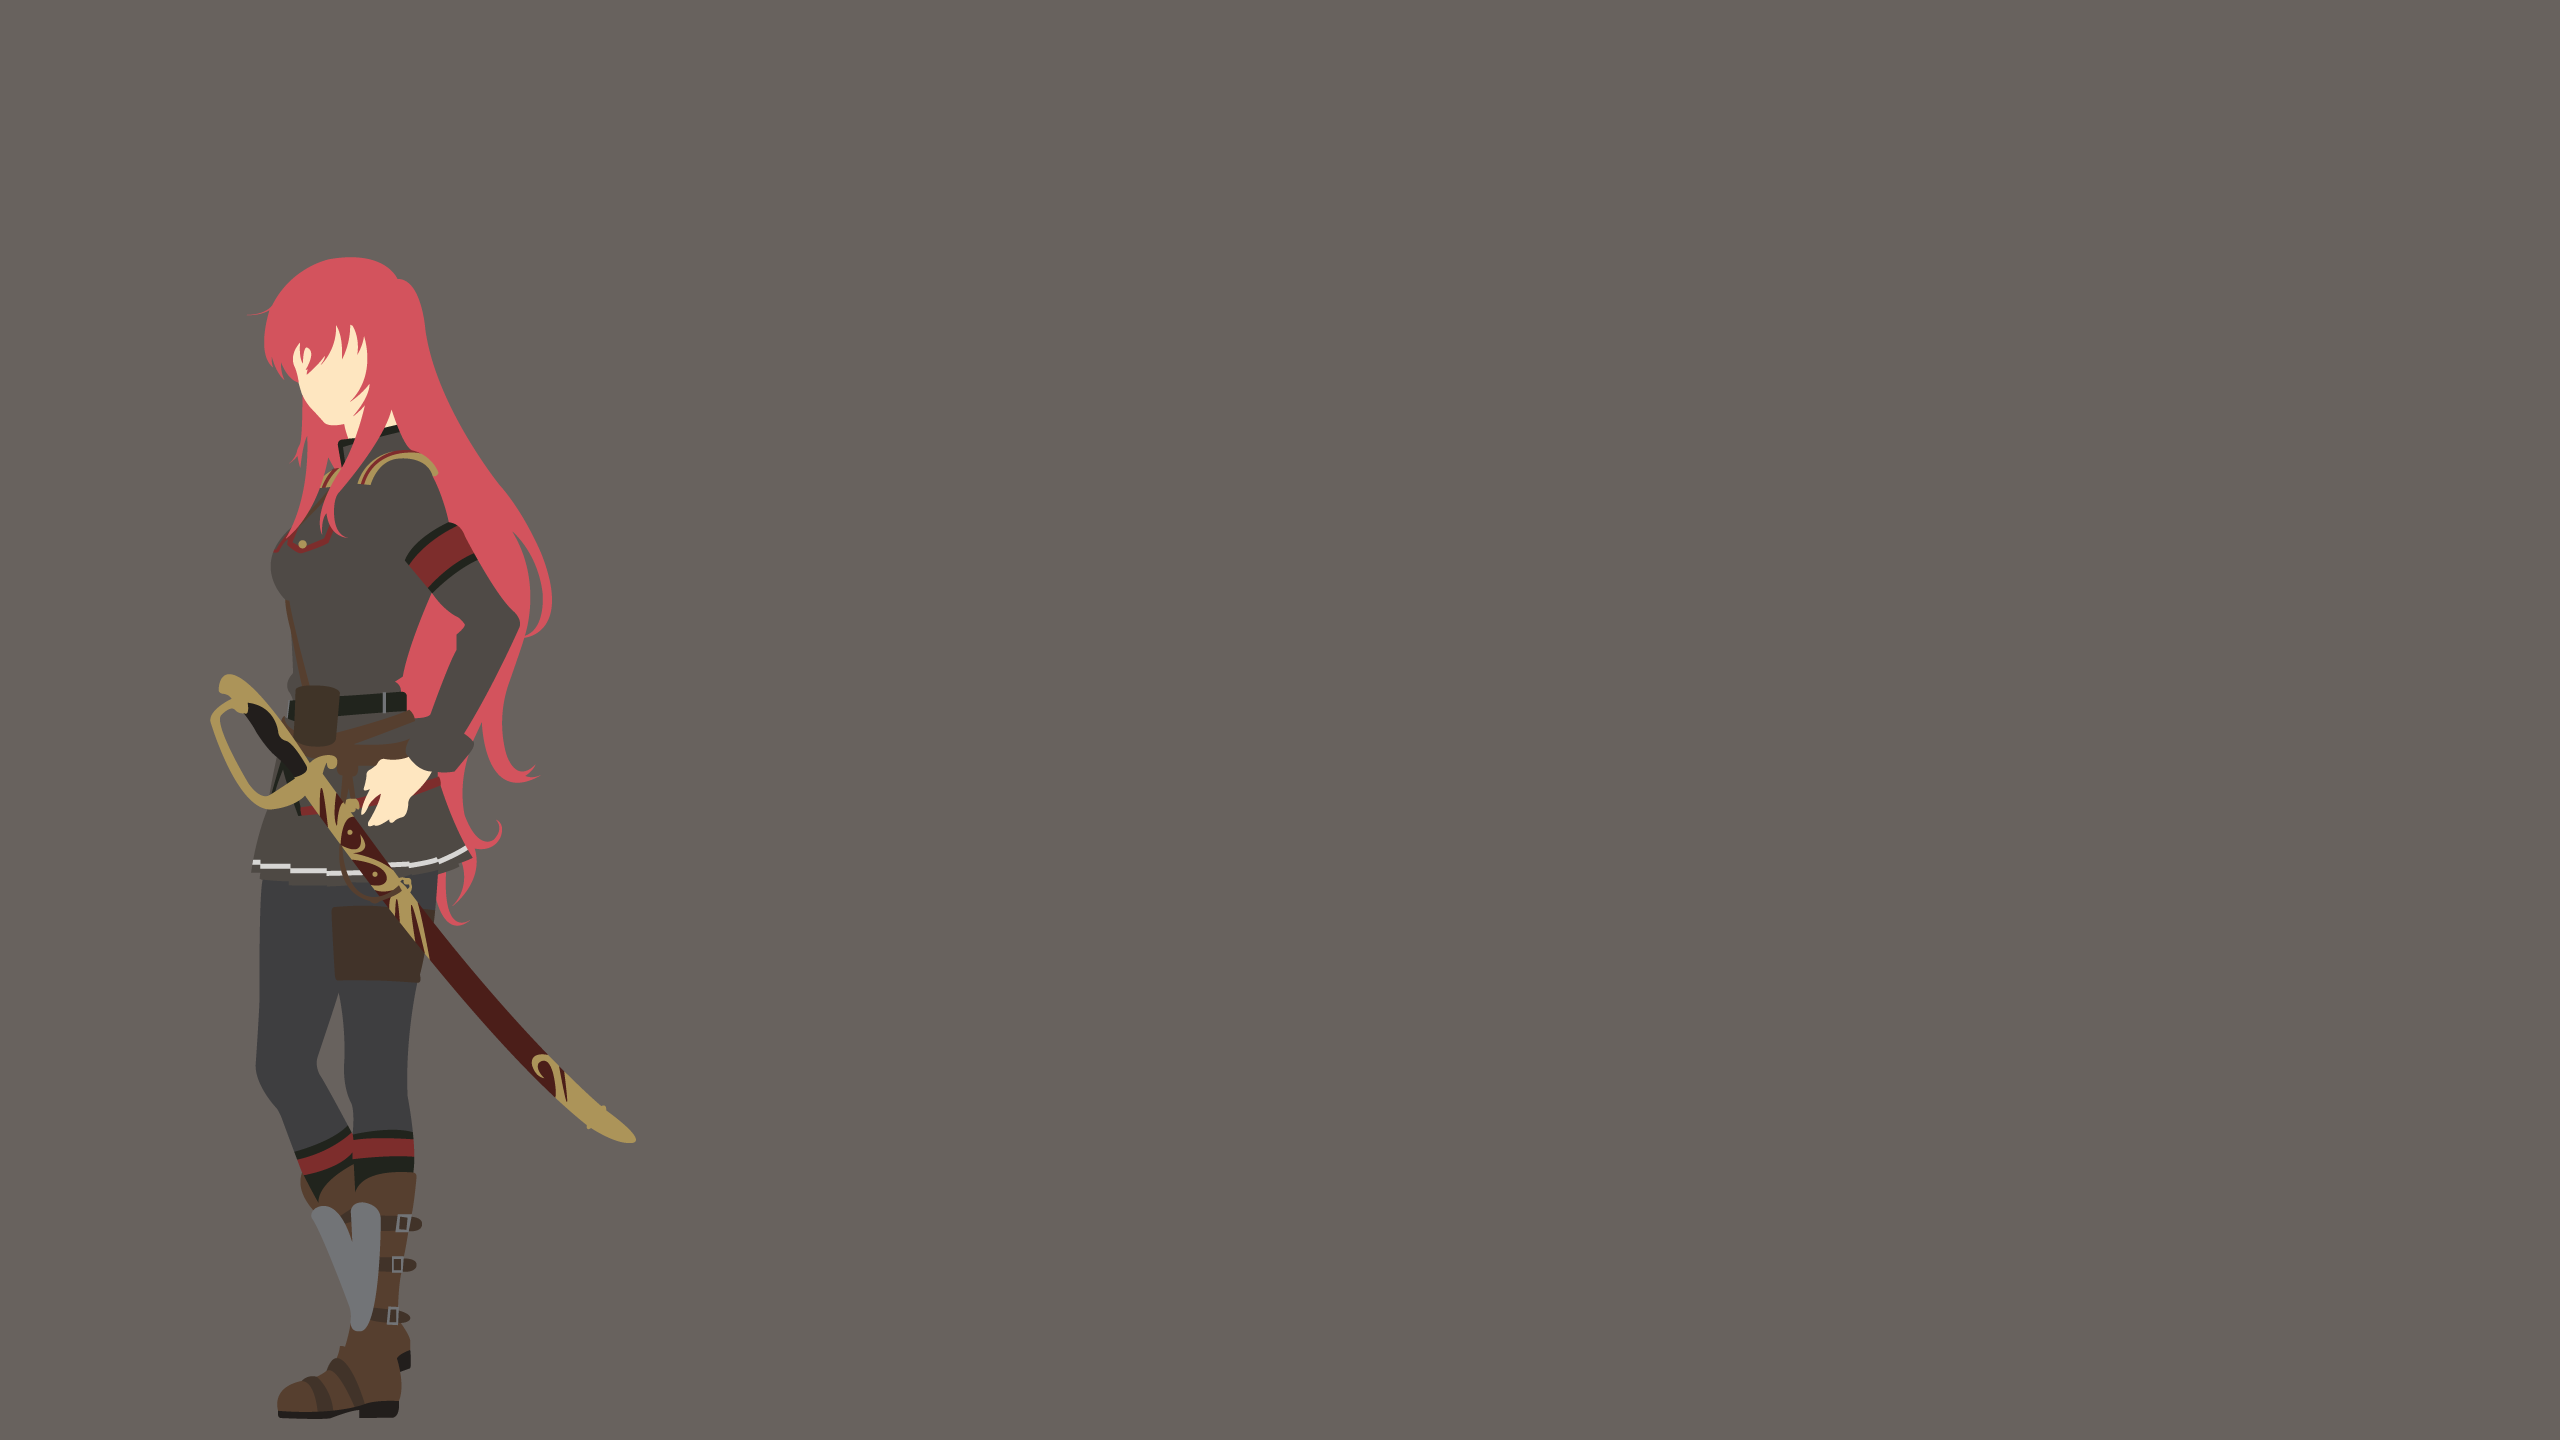 Alderamin On The Sky Hd Wallpaper Background Image 2560x1440